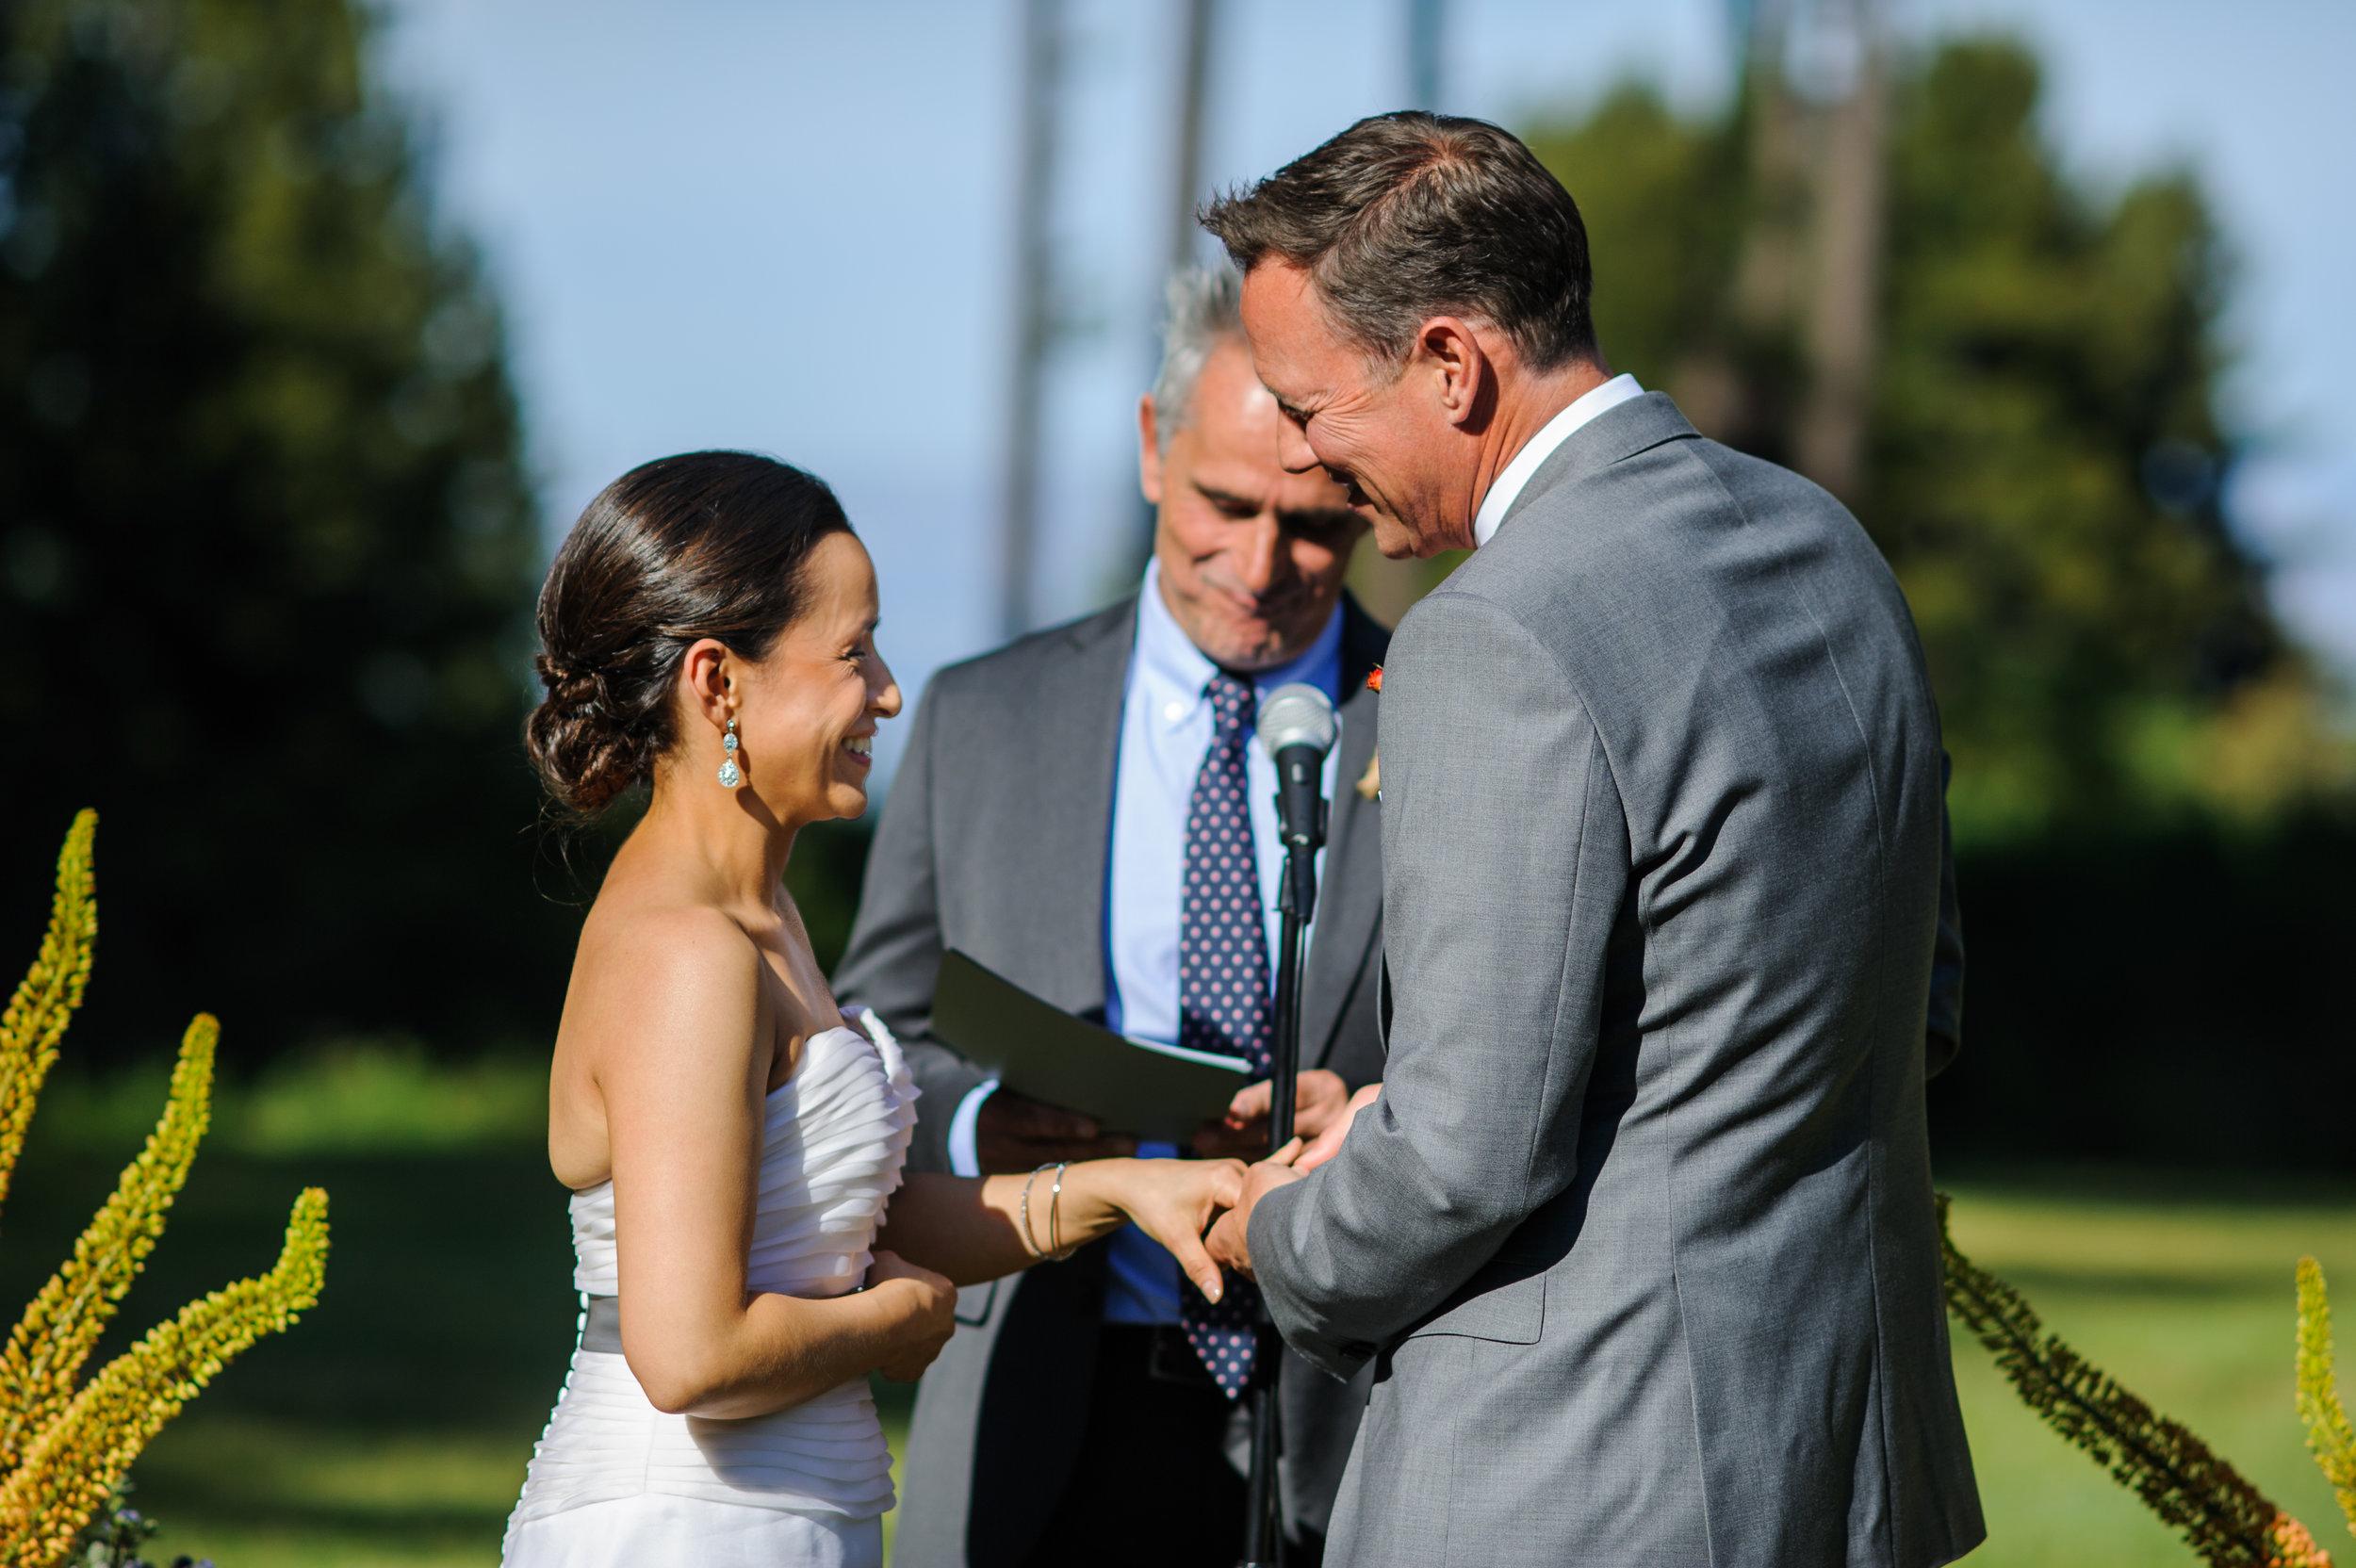 janet-jeremy-023-mountain-terrace-woodside-wedding-photographer-katherine-nicole-photography.JPG